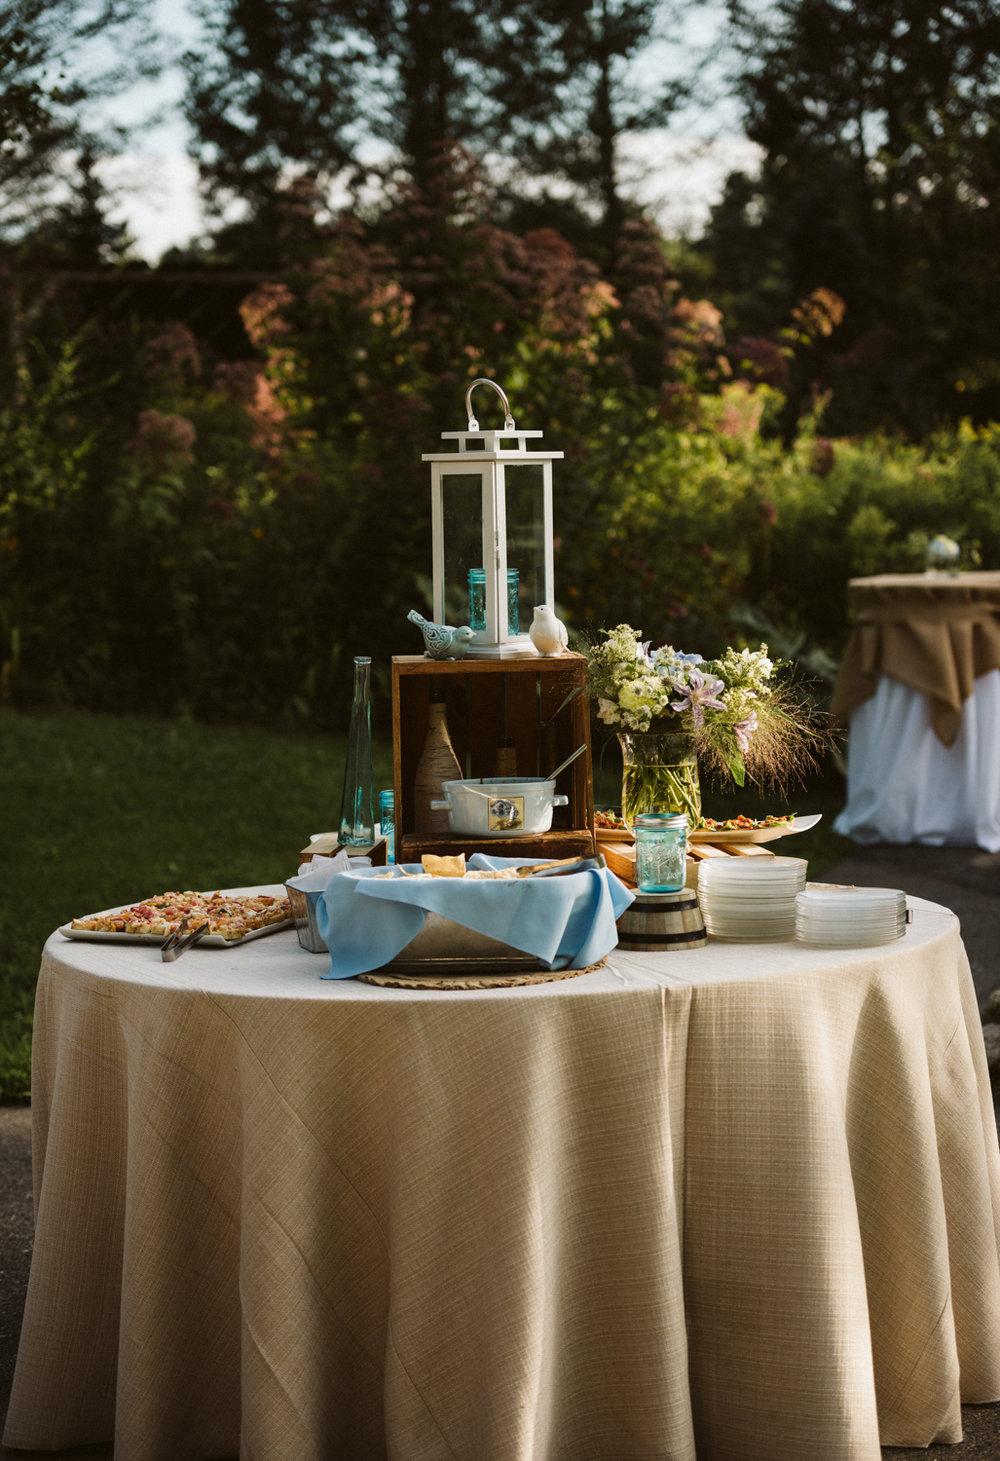 emily_alex_elm_bank_wedding_wellesley_DSC_7824.jpg